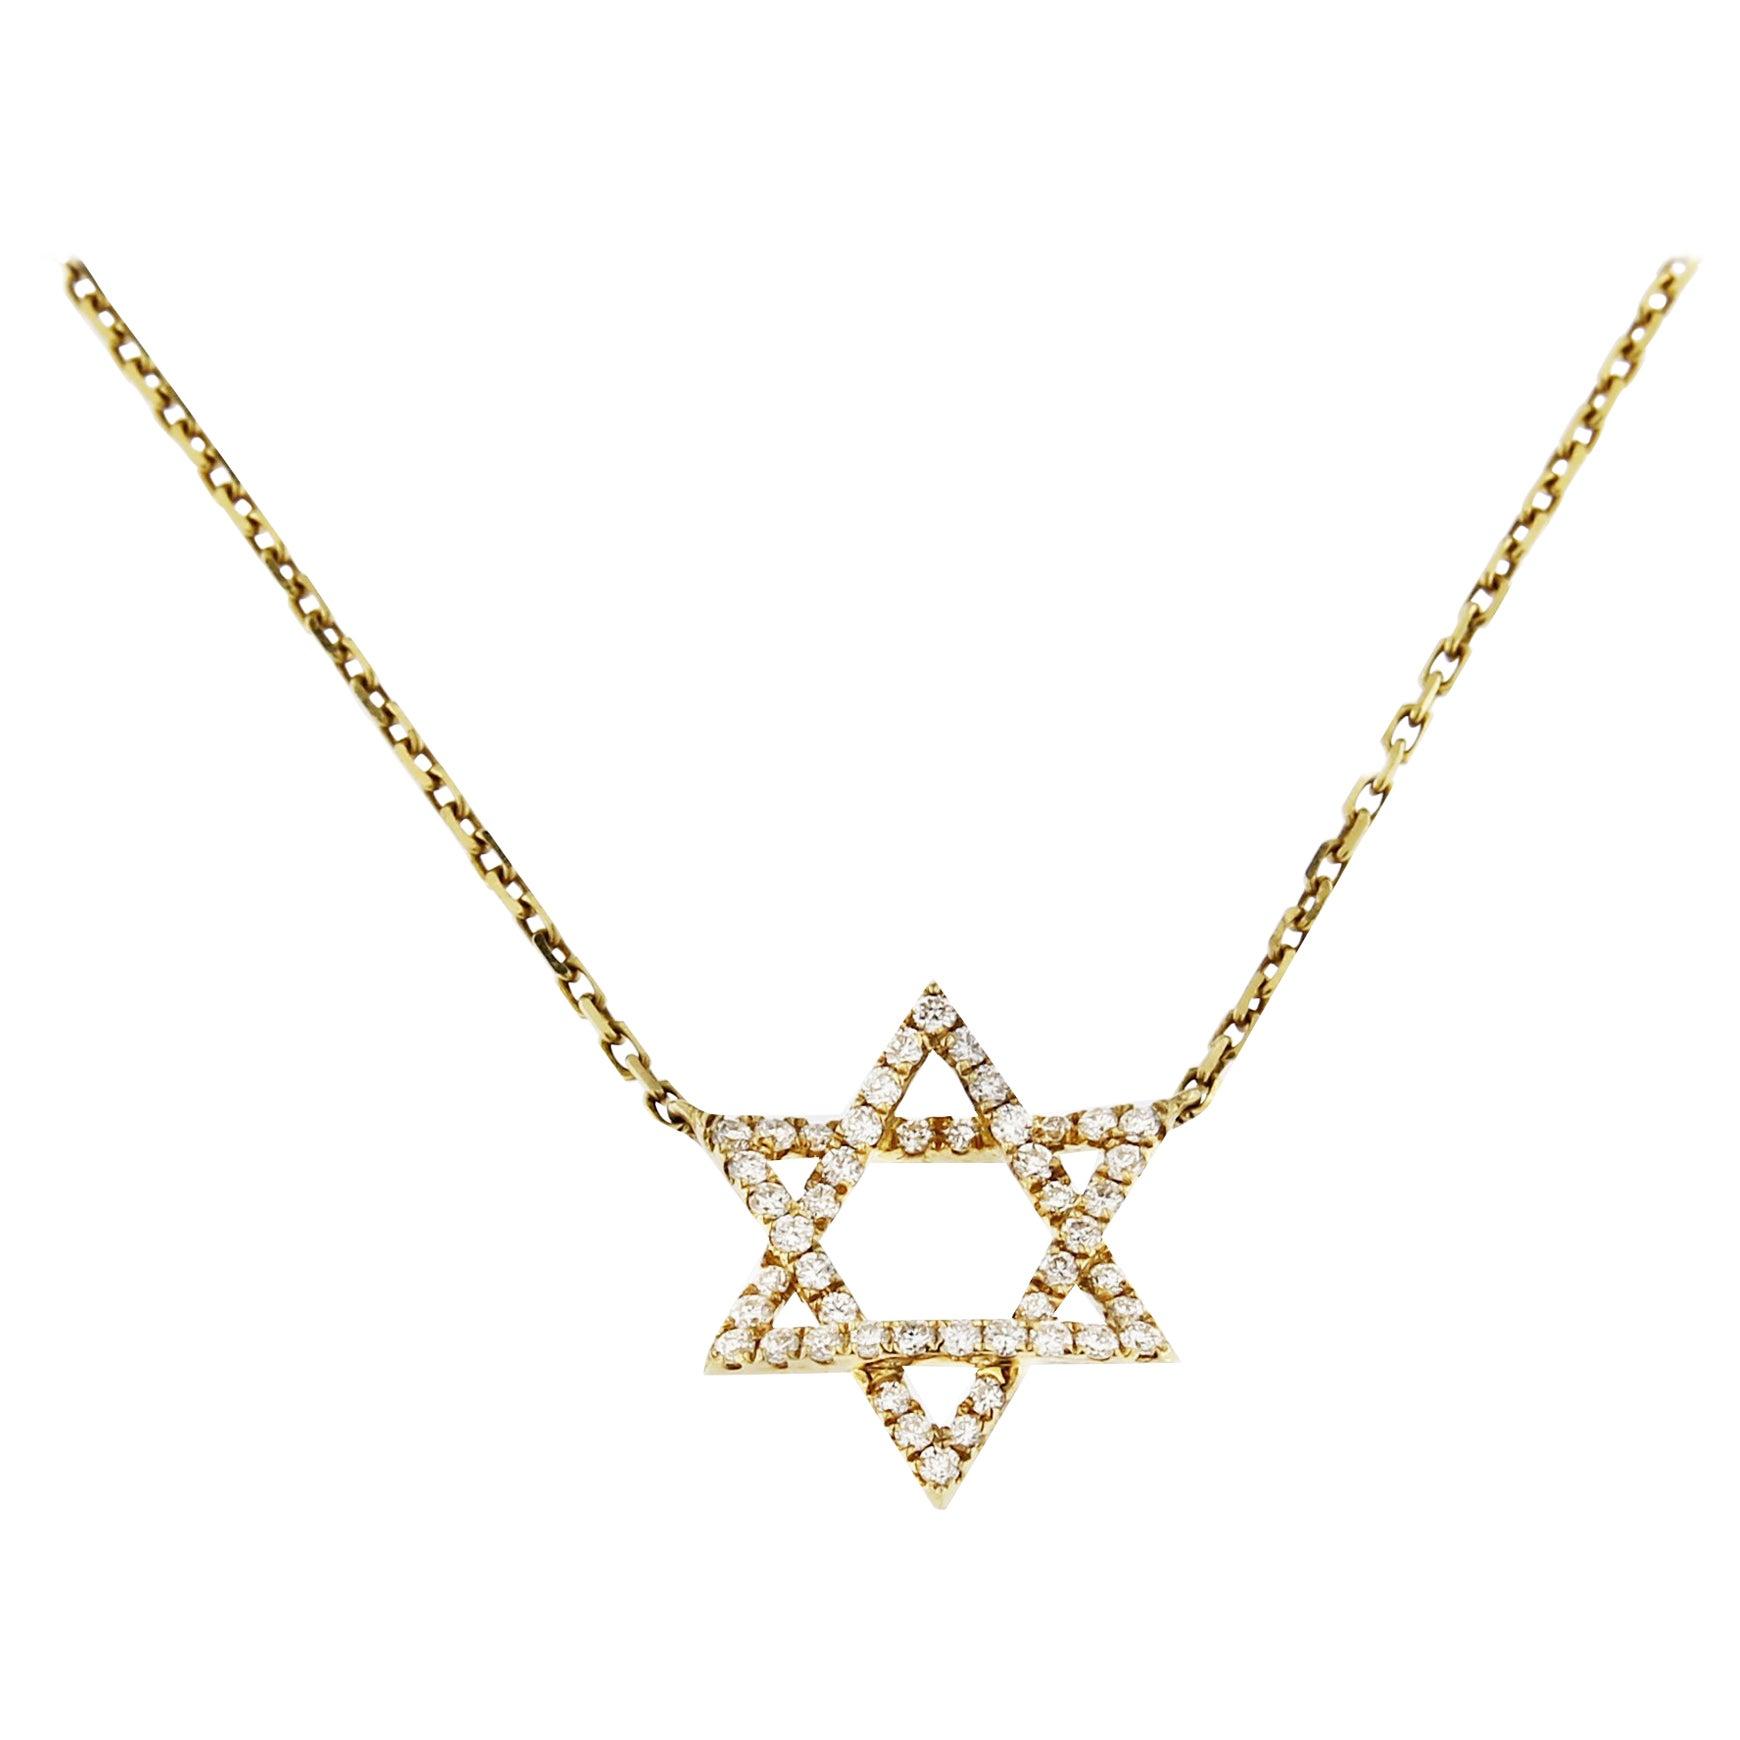 Jona White Diamond 18 Karat Yellow Gold Magen David Pendant Necklace